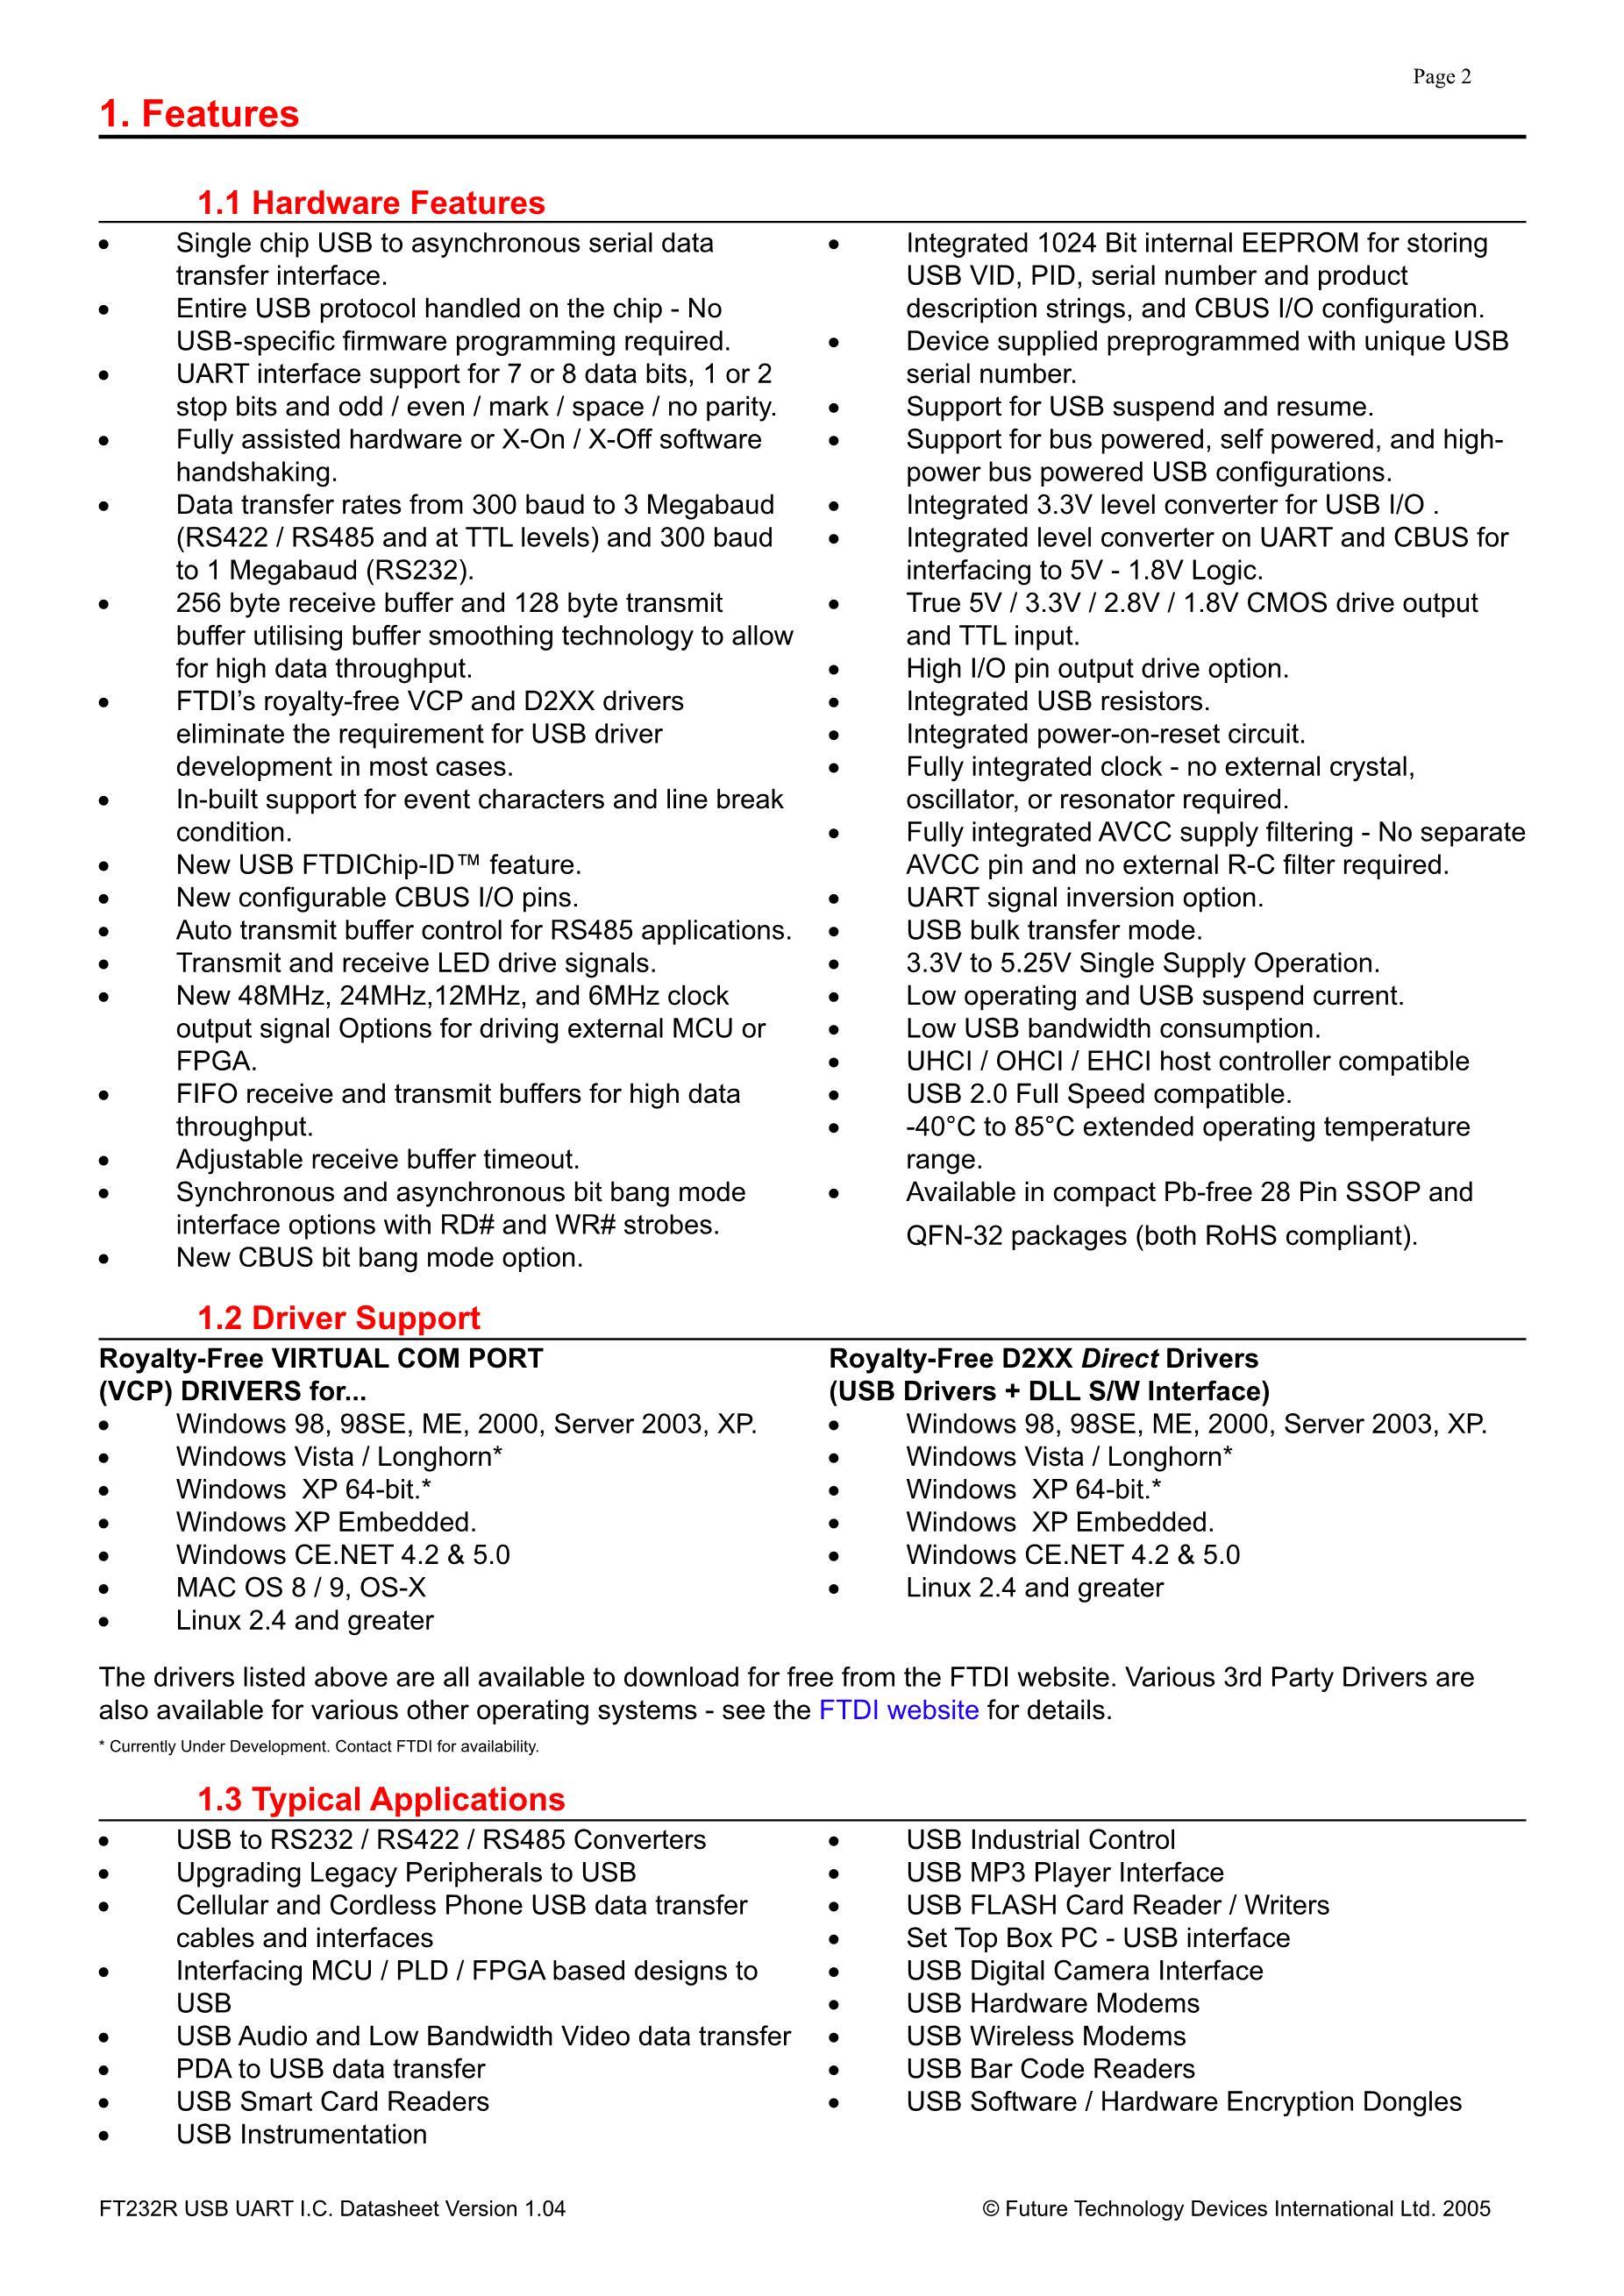 FT232RL SSOP28 FTDI's pdf picture 2